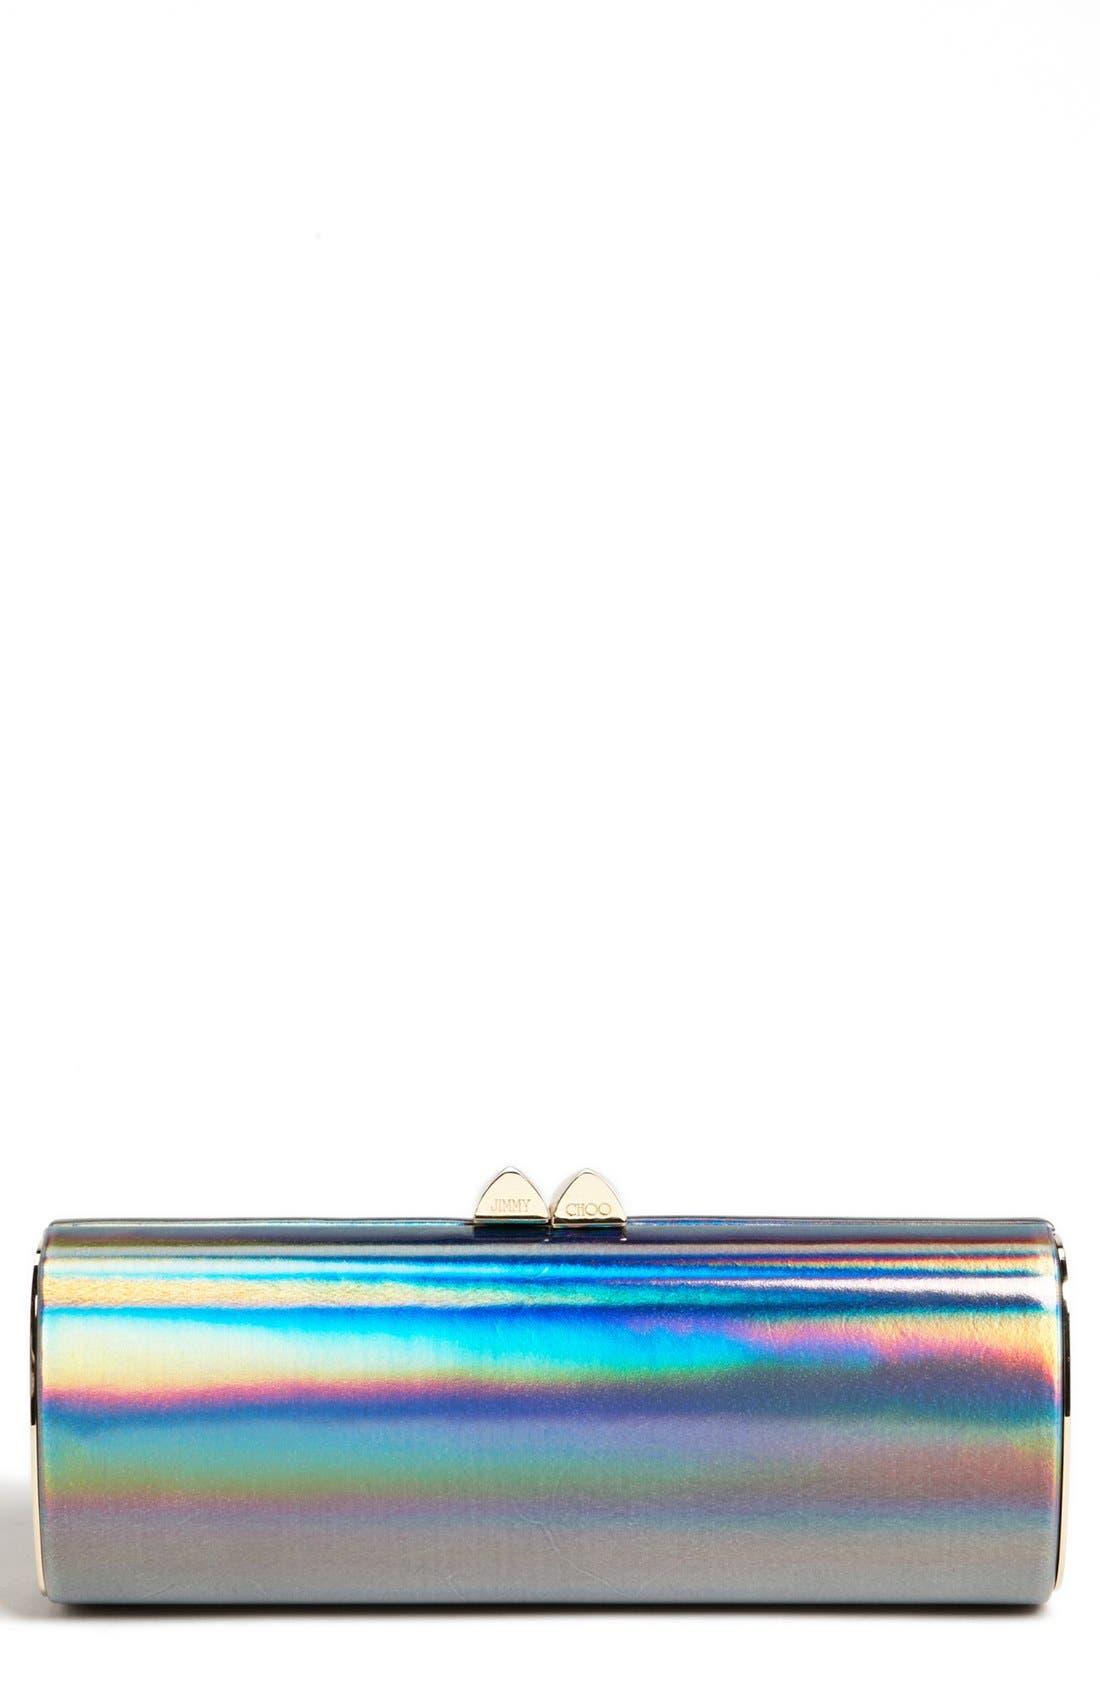 Alternate Image 1 Selected - Jimmy Choo 'Charm - Disco Mirror' Clutch